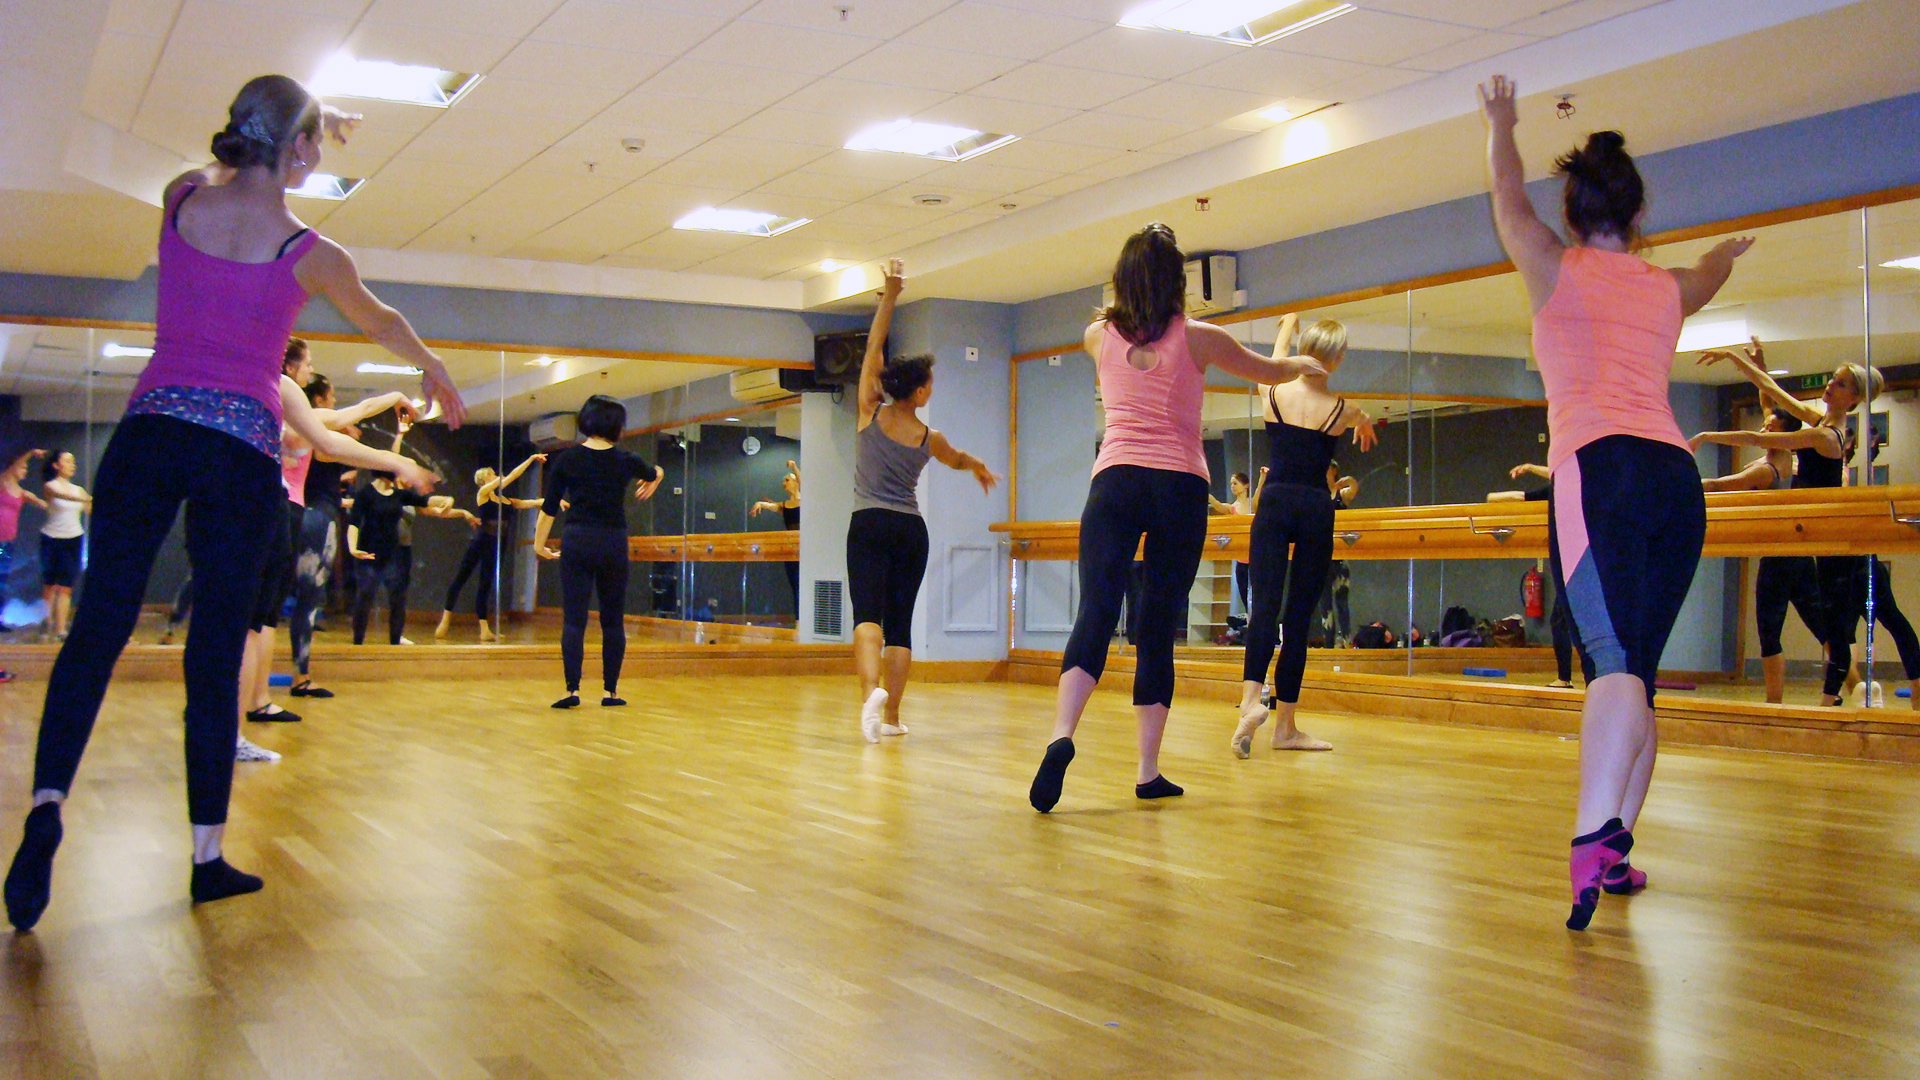 Copy of ballet body sculpture workout classes